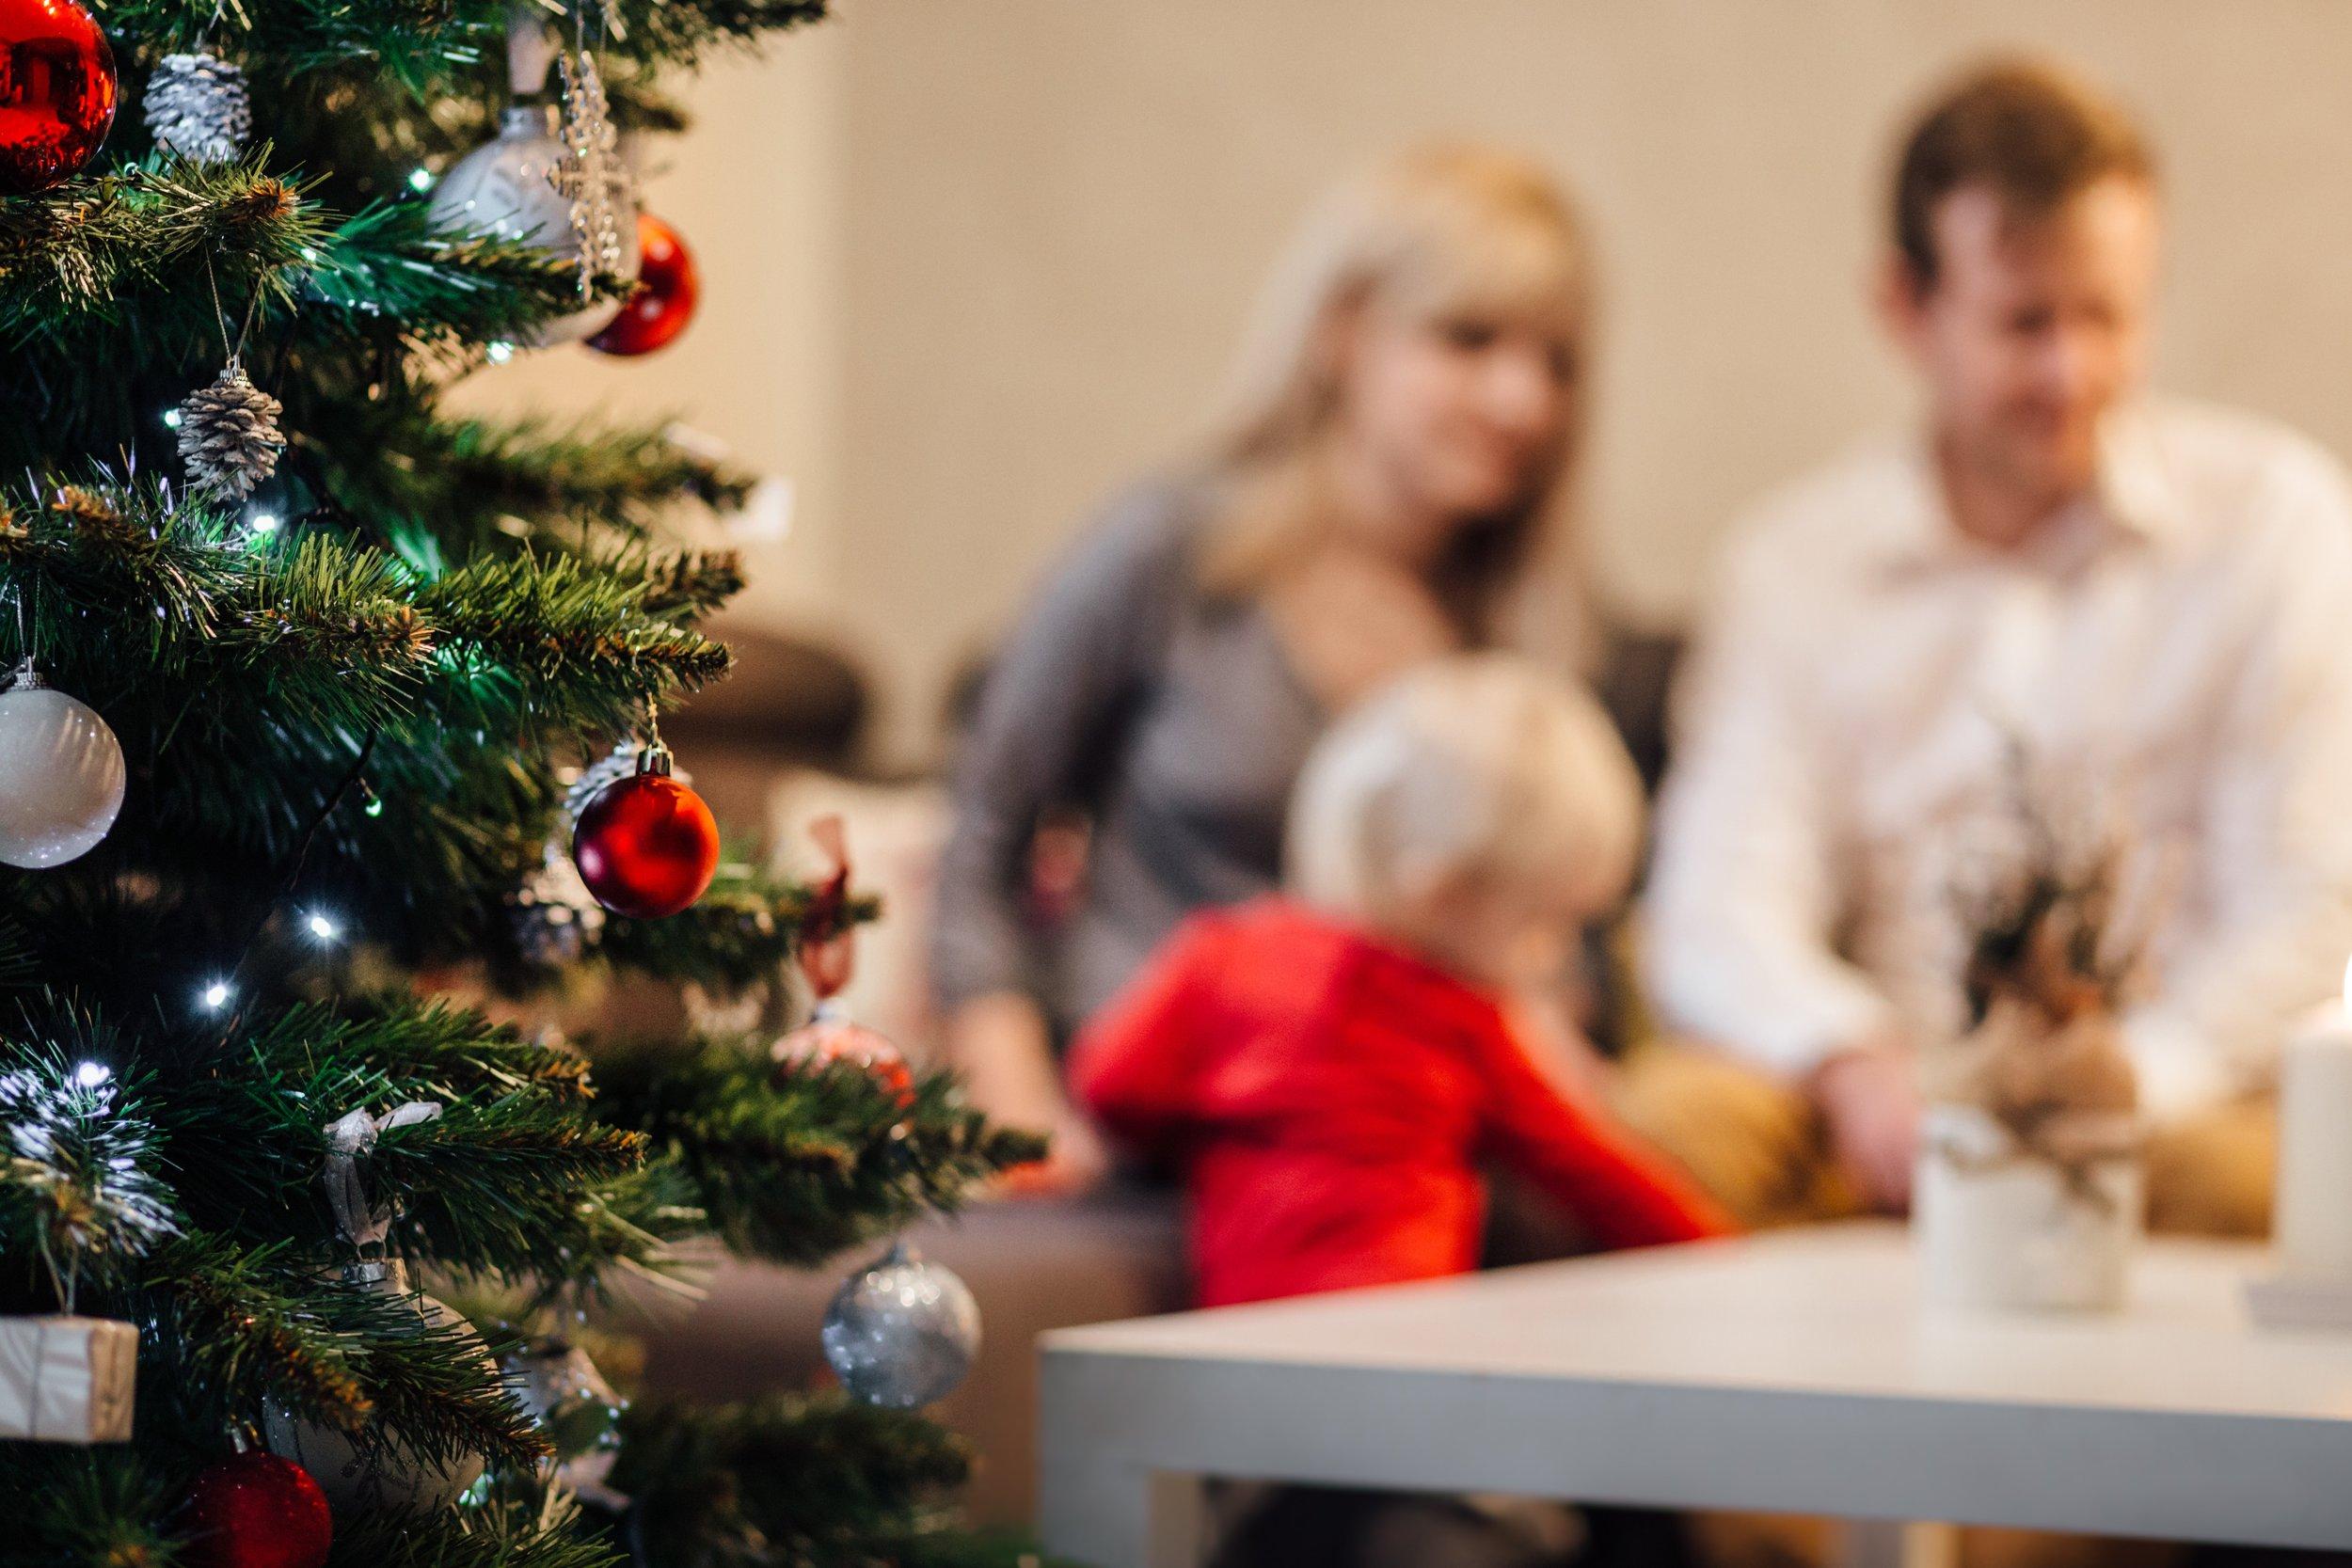 A Legal Christmas